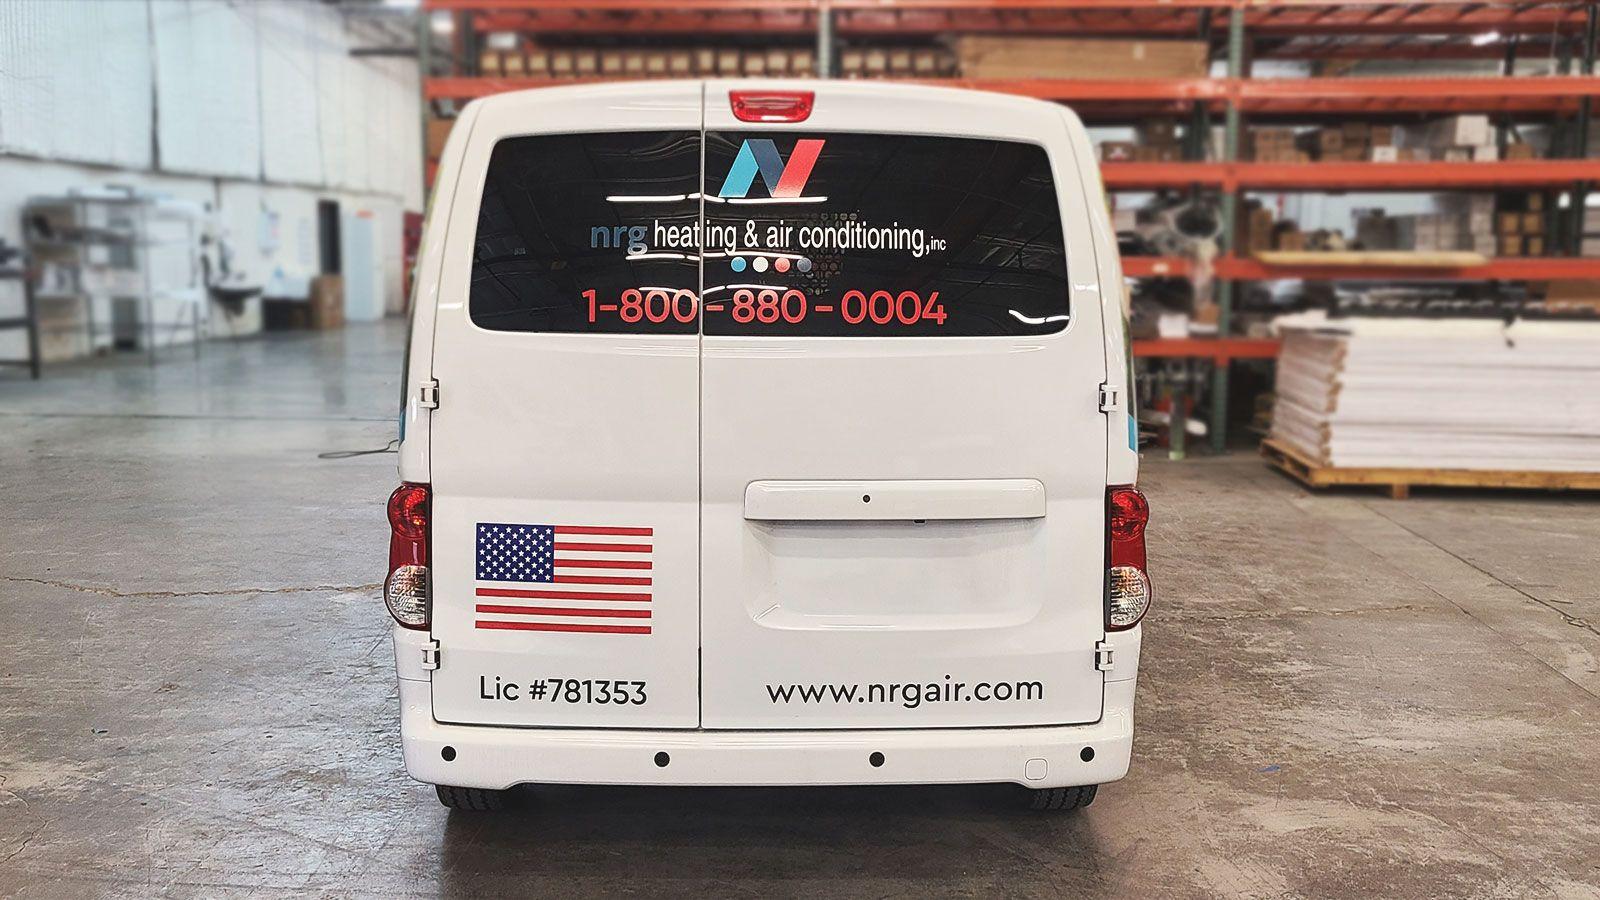 NRG air conditioning car wrap